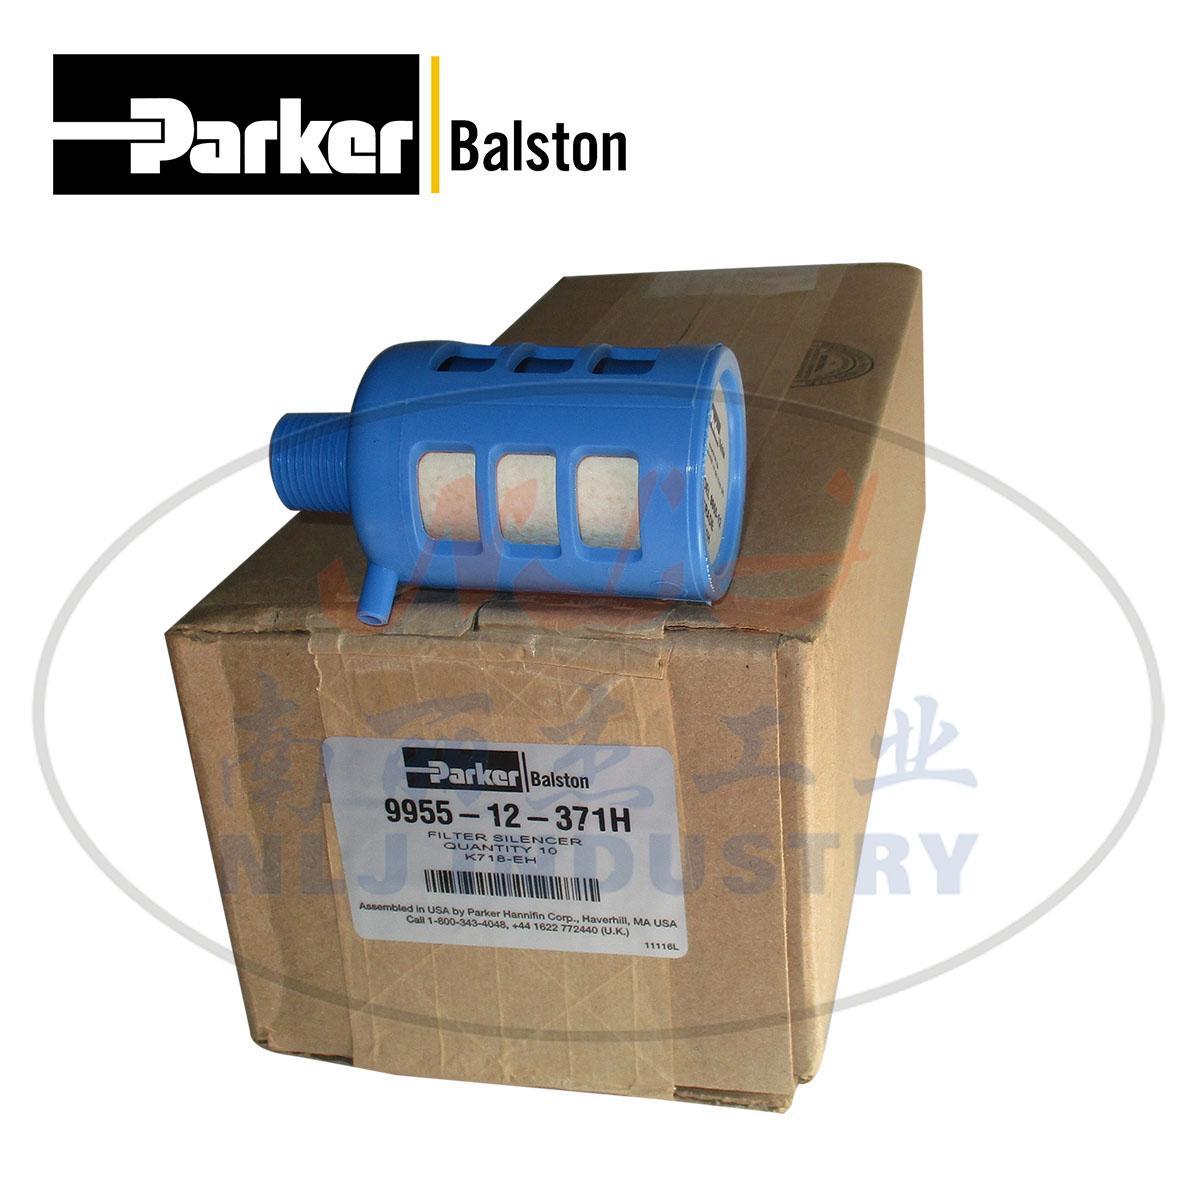 Parker Balston 9955-12-371H Vacuum Pump Exhaust Filters 5